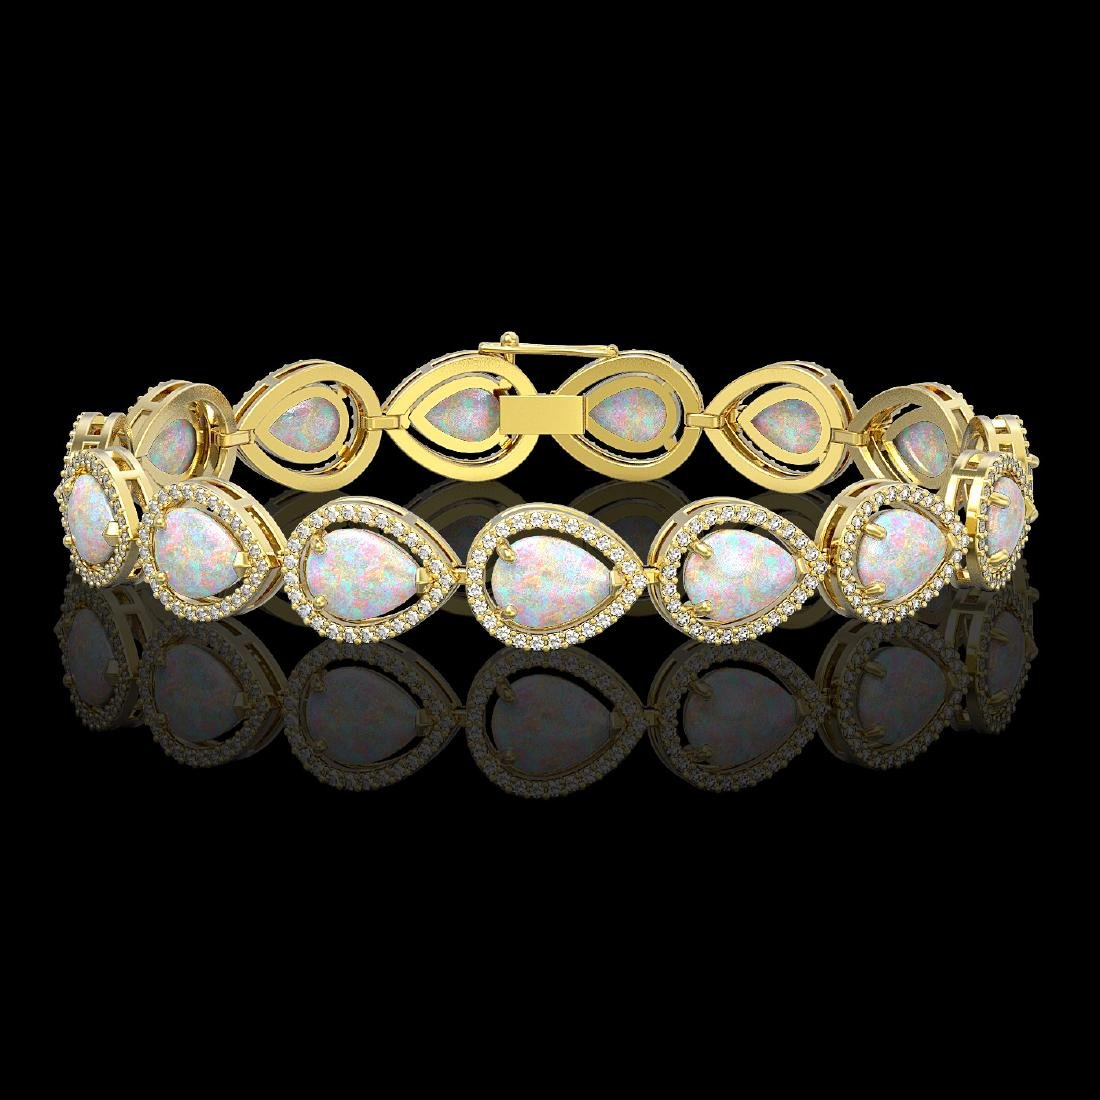 17.15 CTW Opal & Diamond Halo Bracelet 10K Yellow Gold